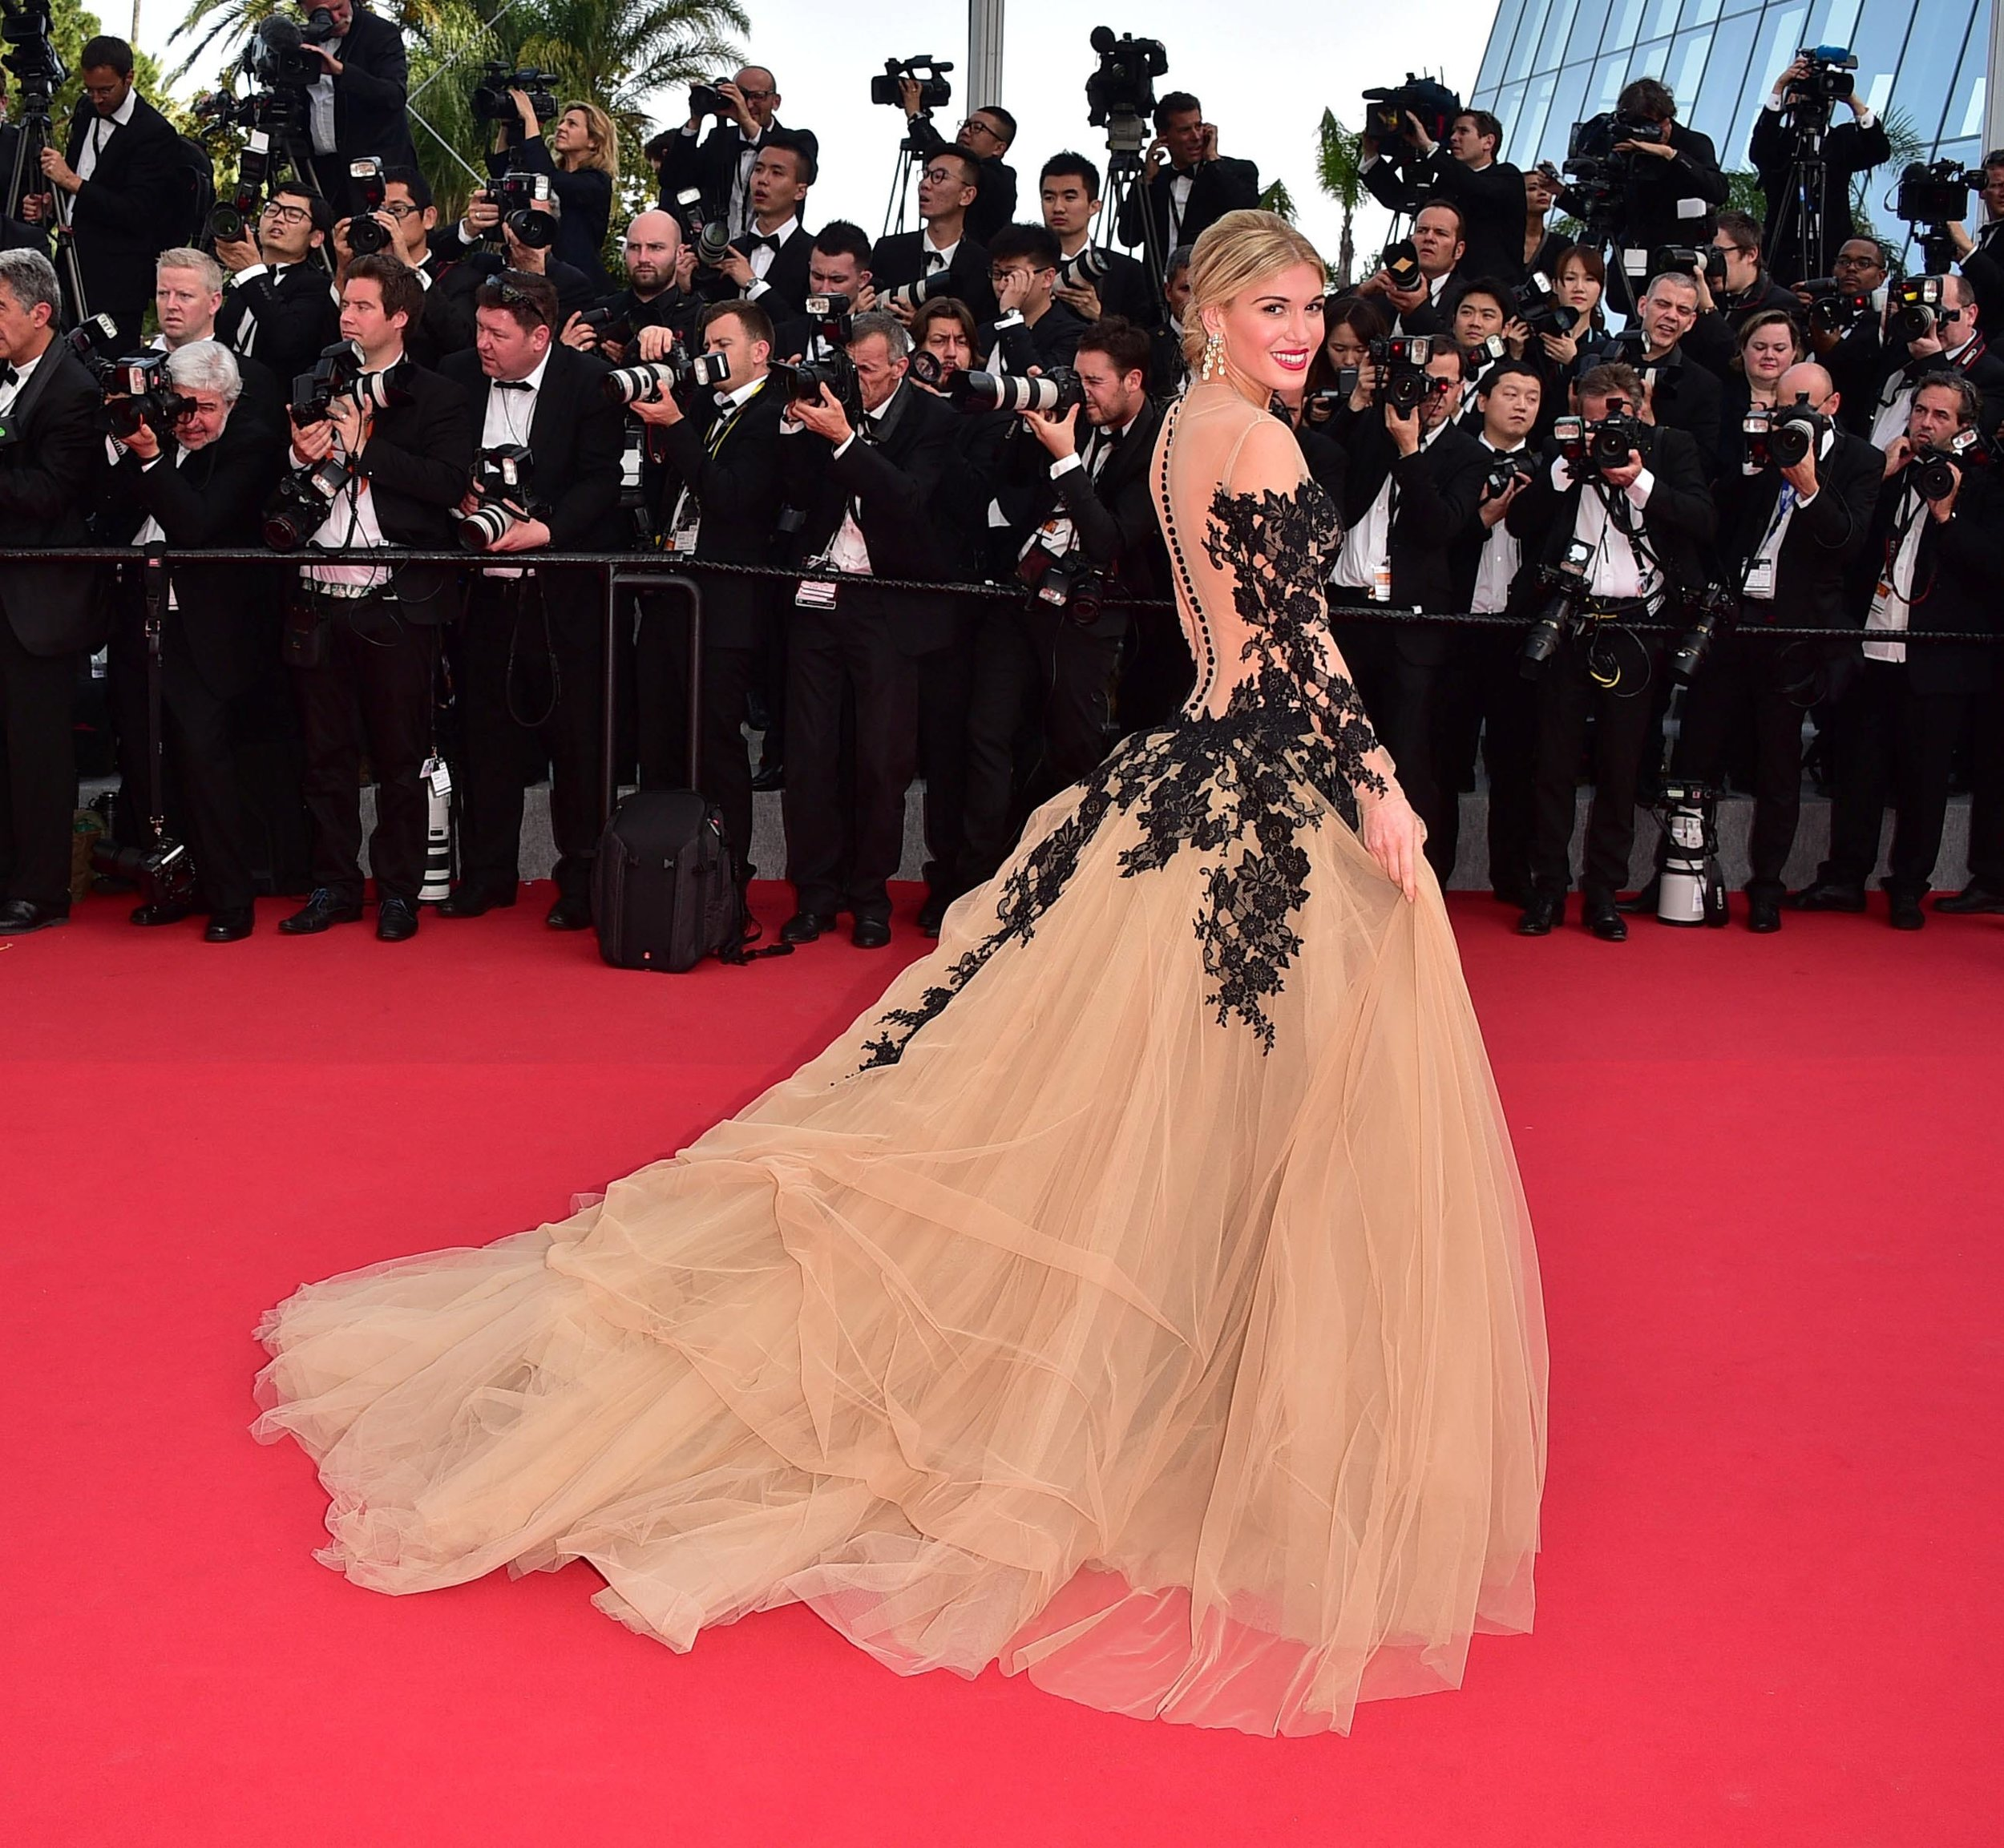 Cannes-2015-HOFIT-GOLAN-1_1.jpg